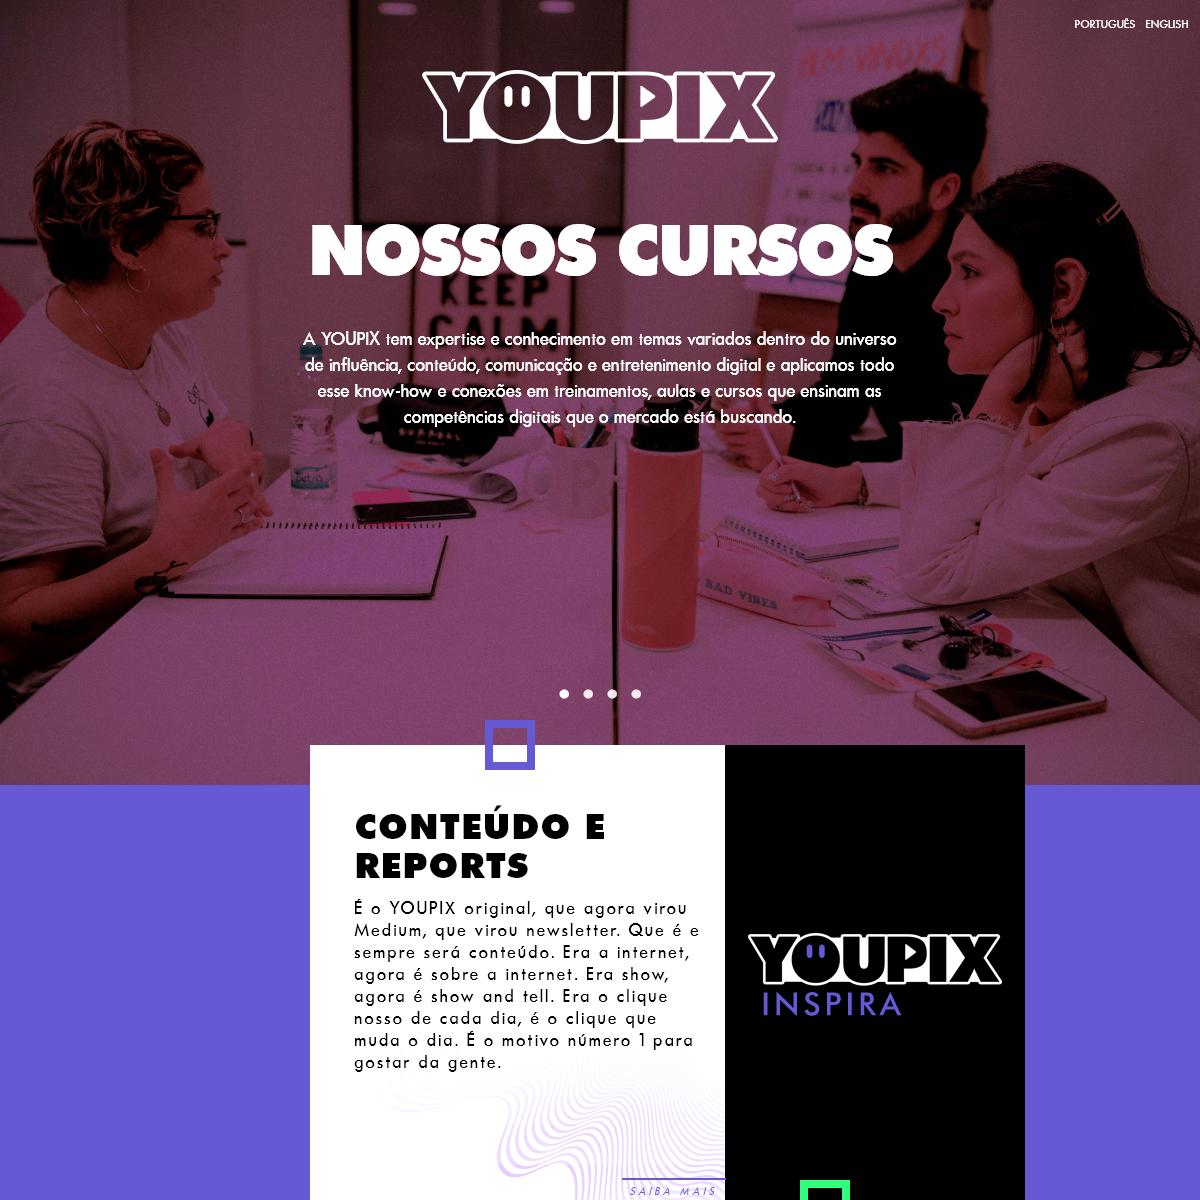 YOUPIX - we -3 creators